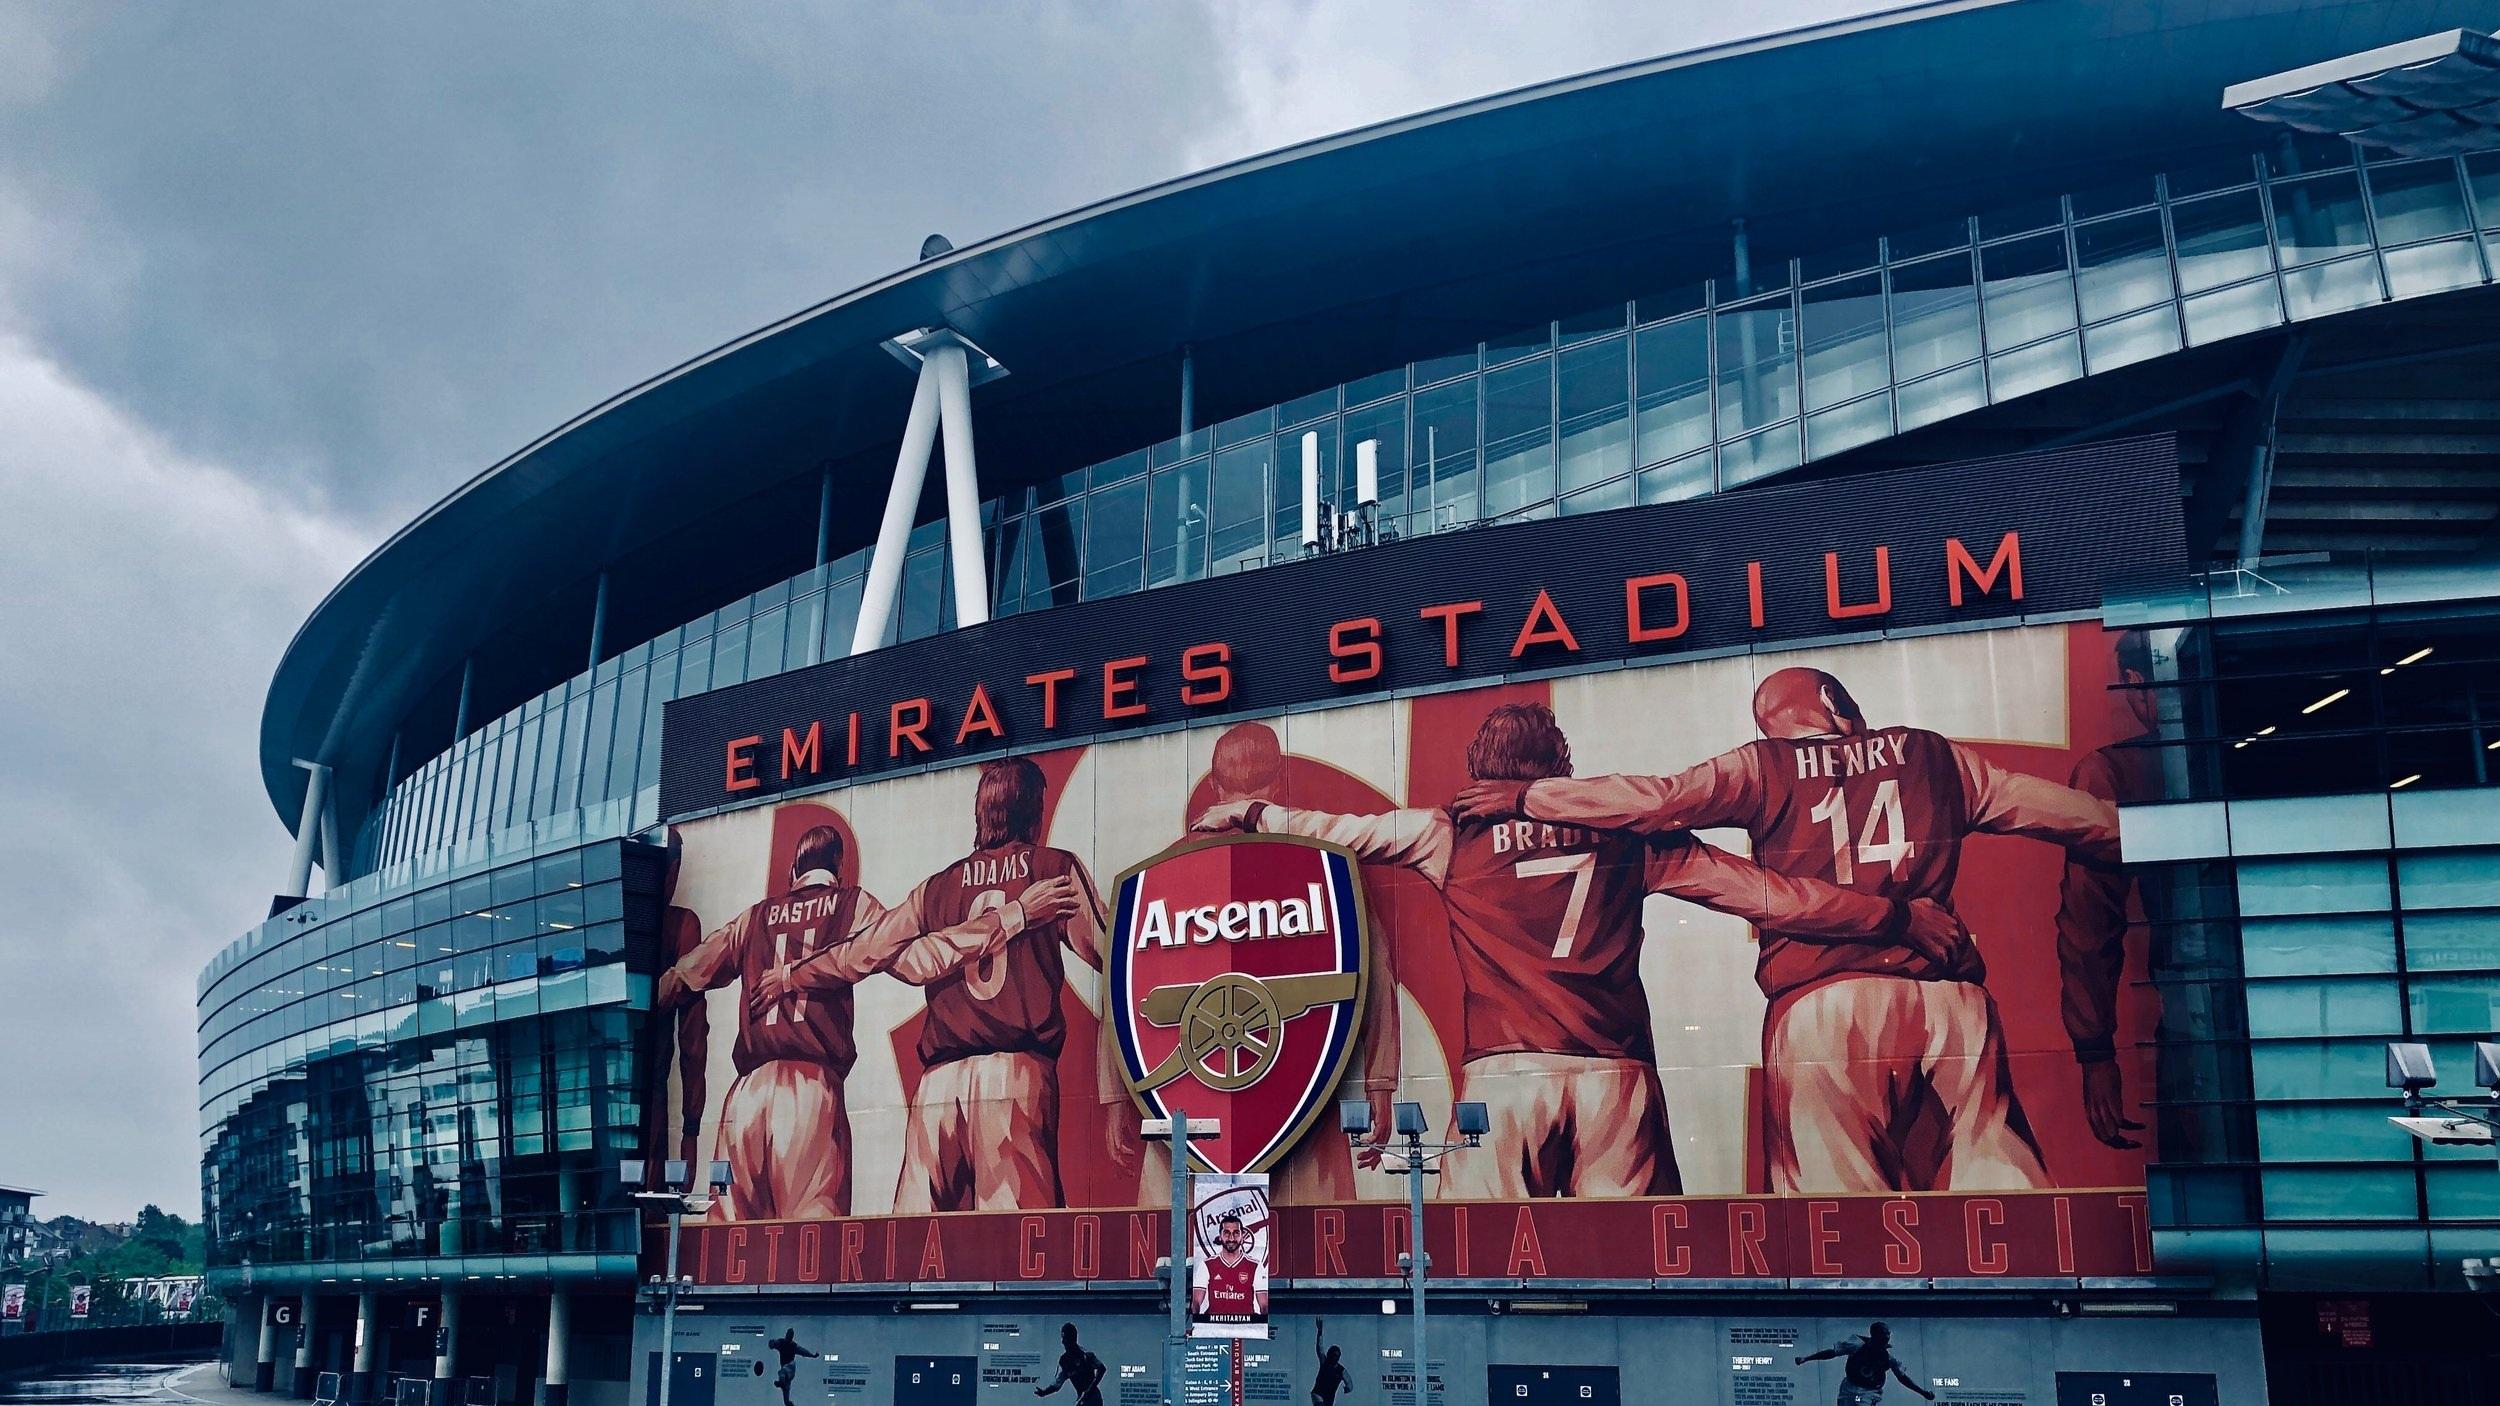 Arsenal - LONDON, ENGLAND